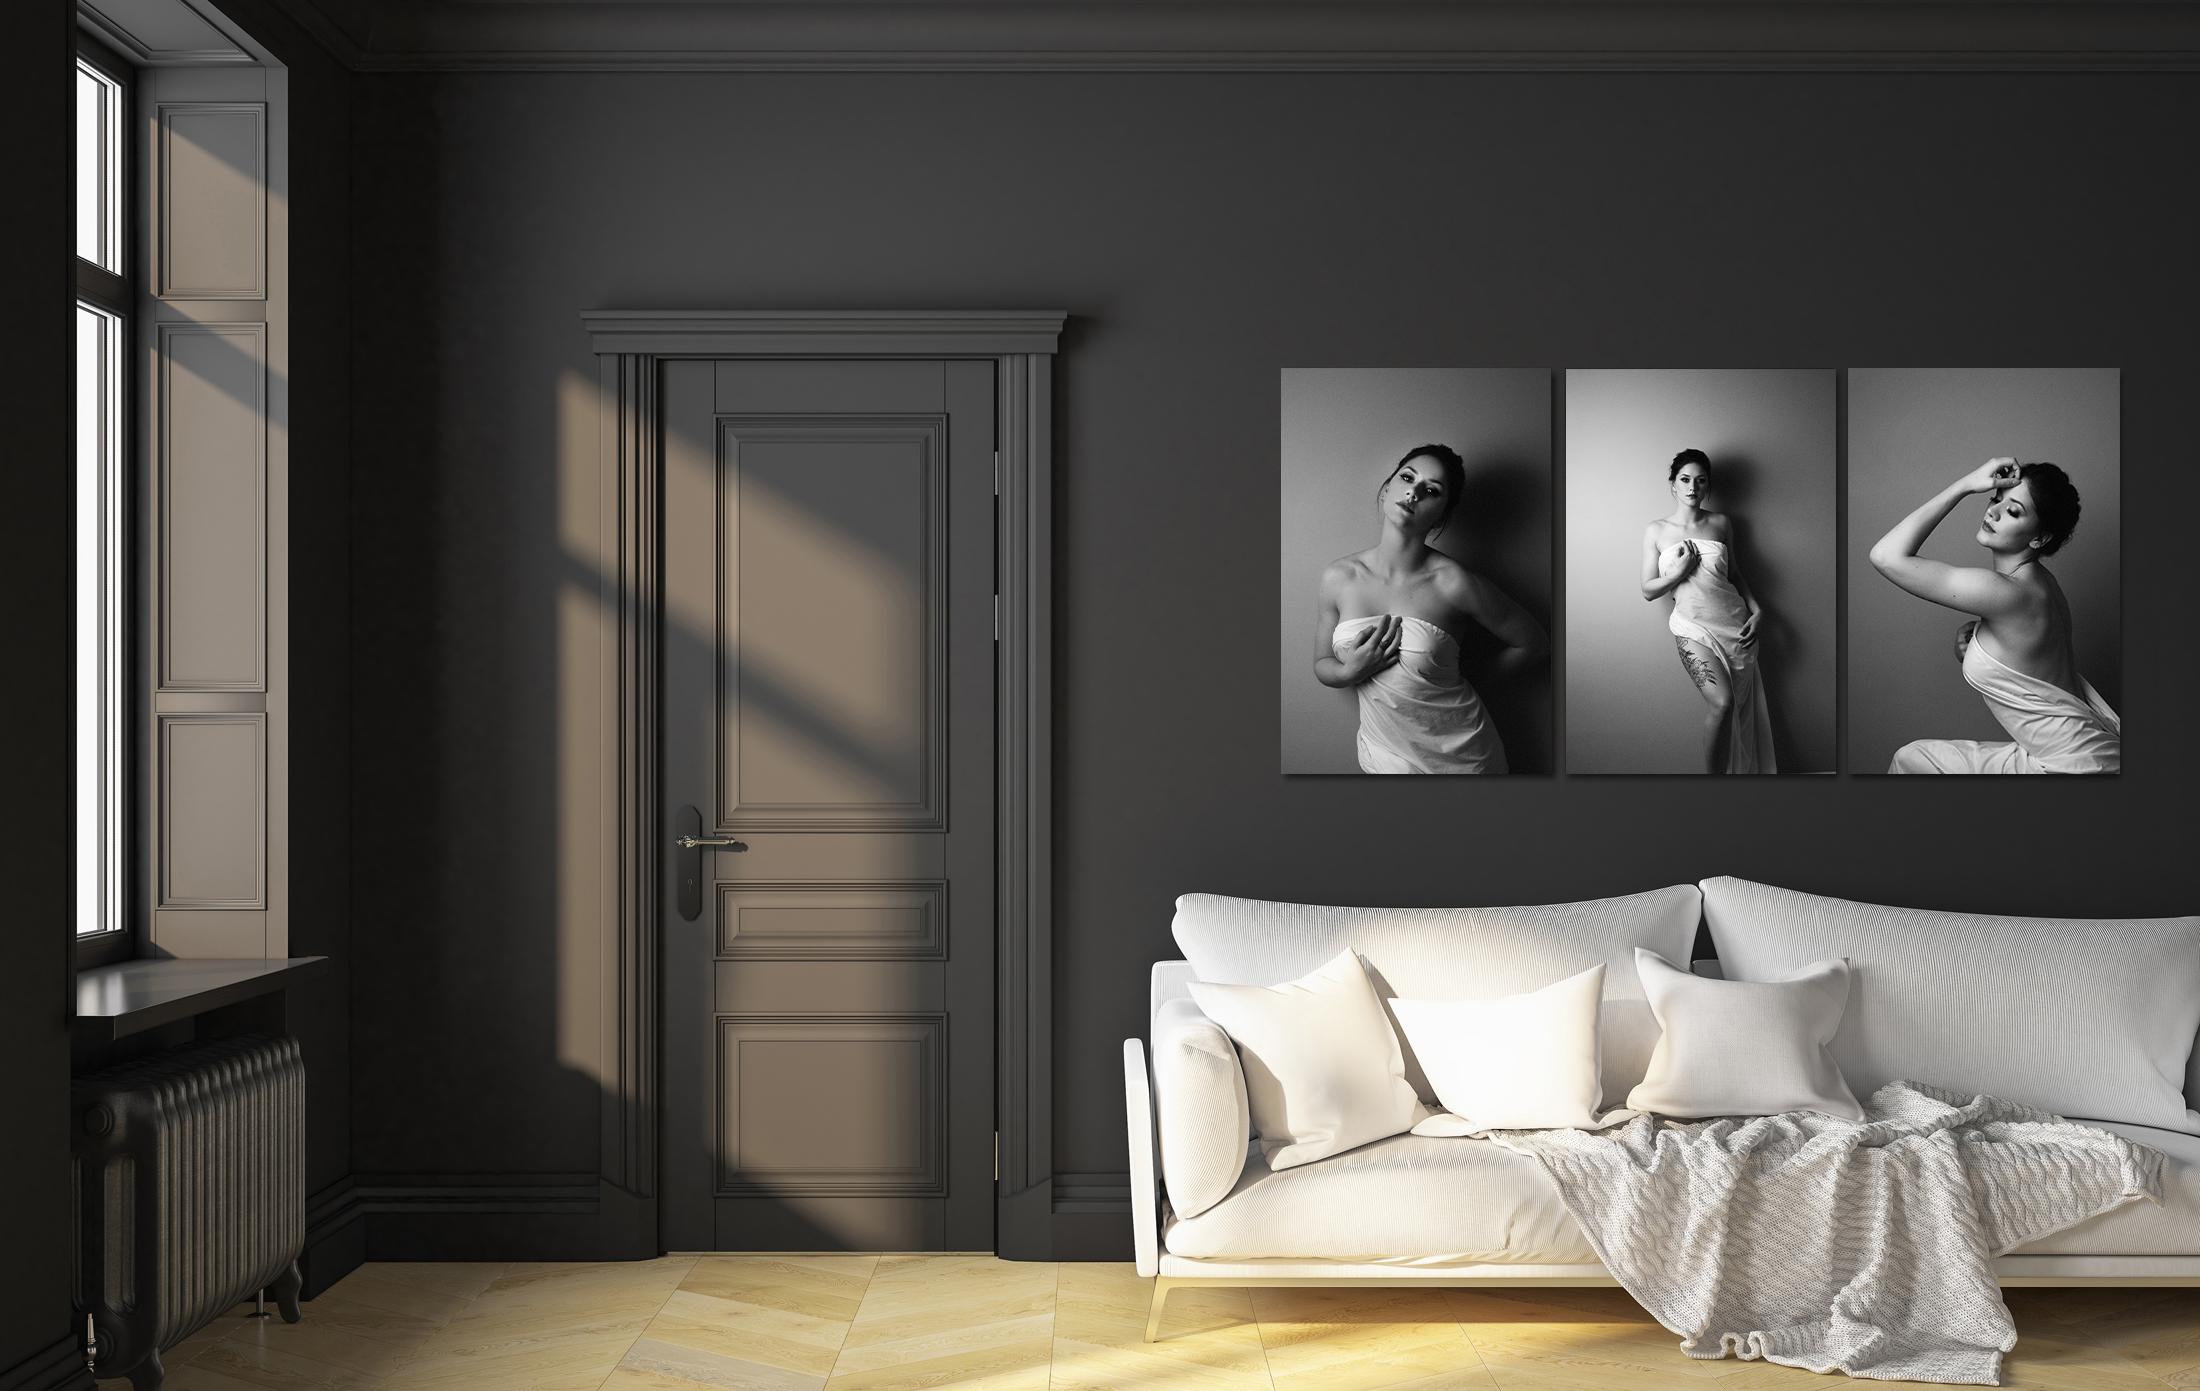 wall_art_ambient_akhankina.jpg